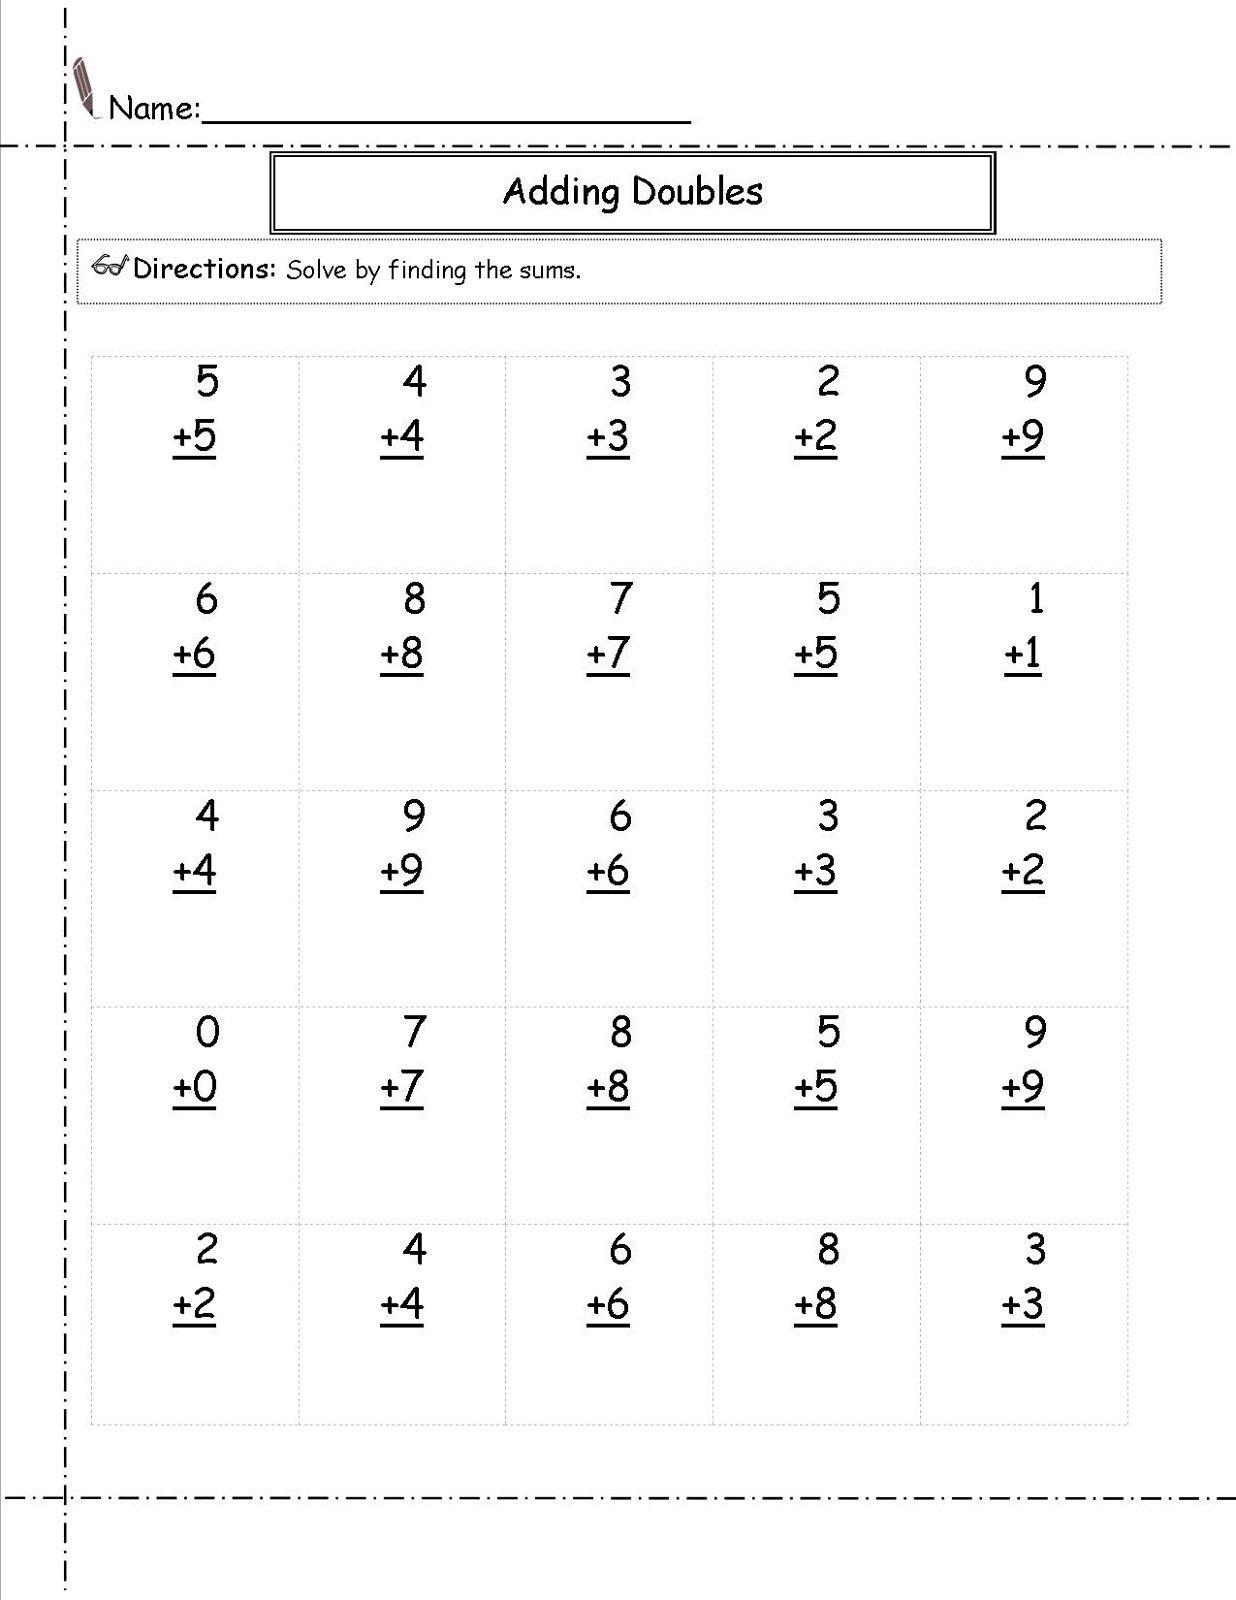 Free Addition Worksheets Multiplication Worksheets Addition Worksheets Multiplication Facts Worksheets